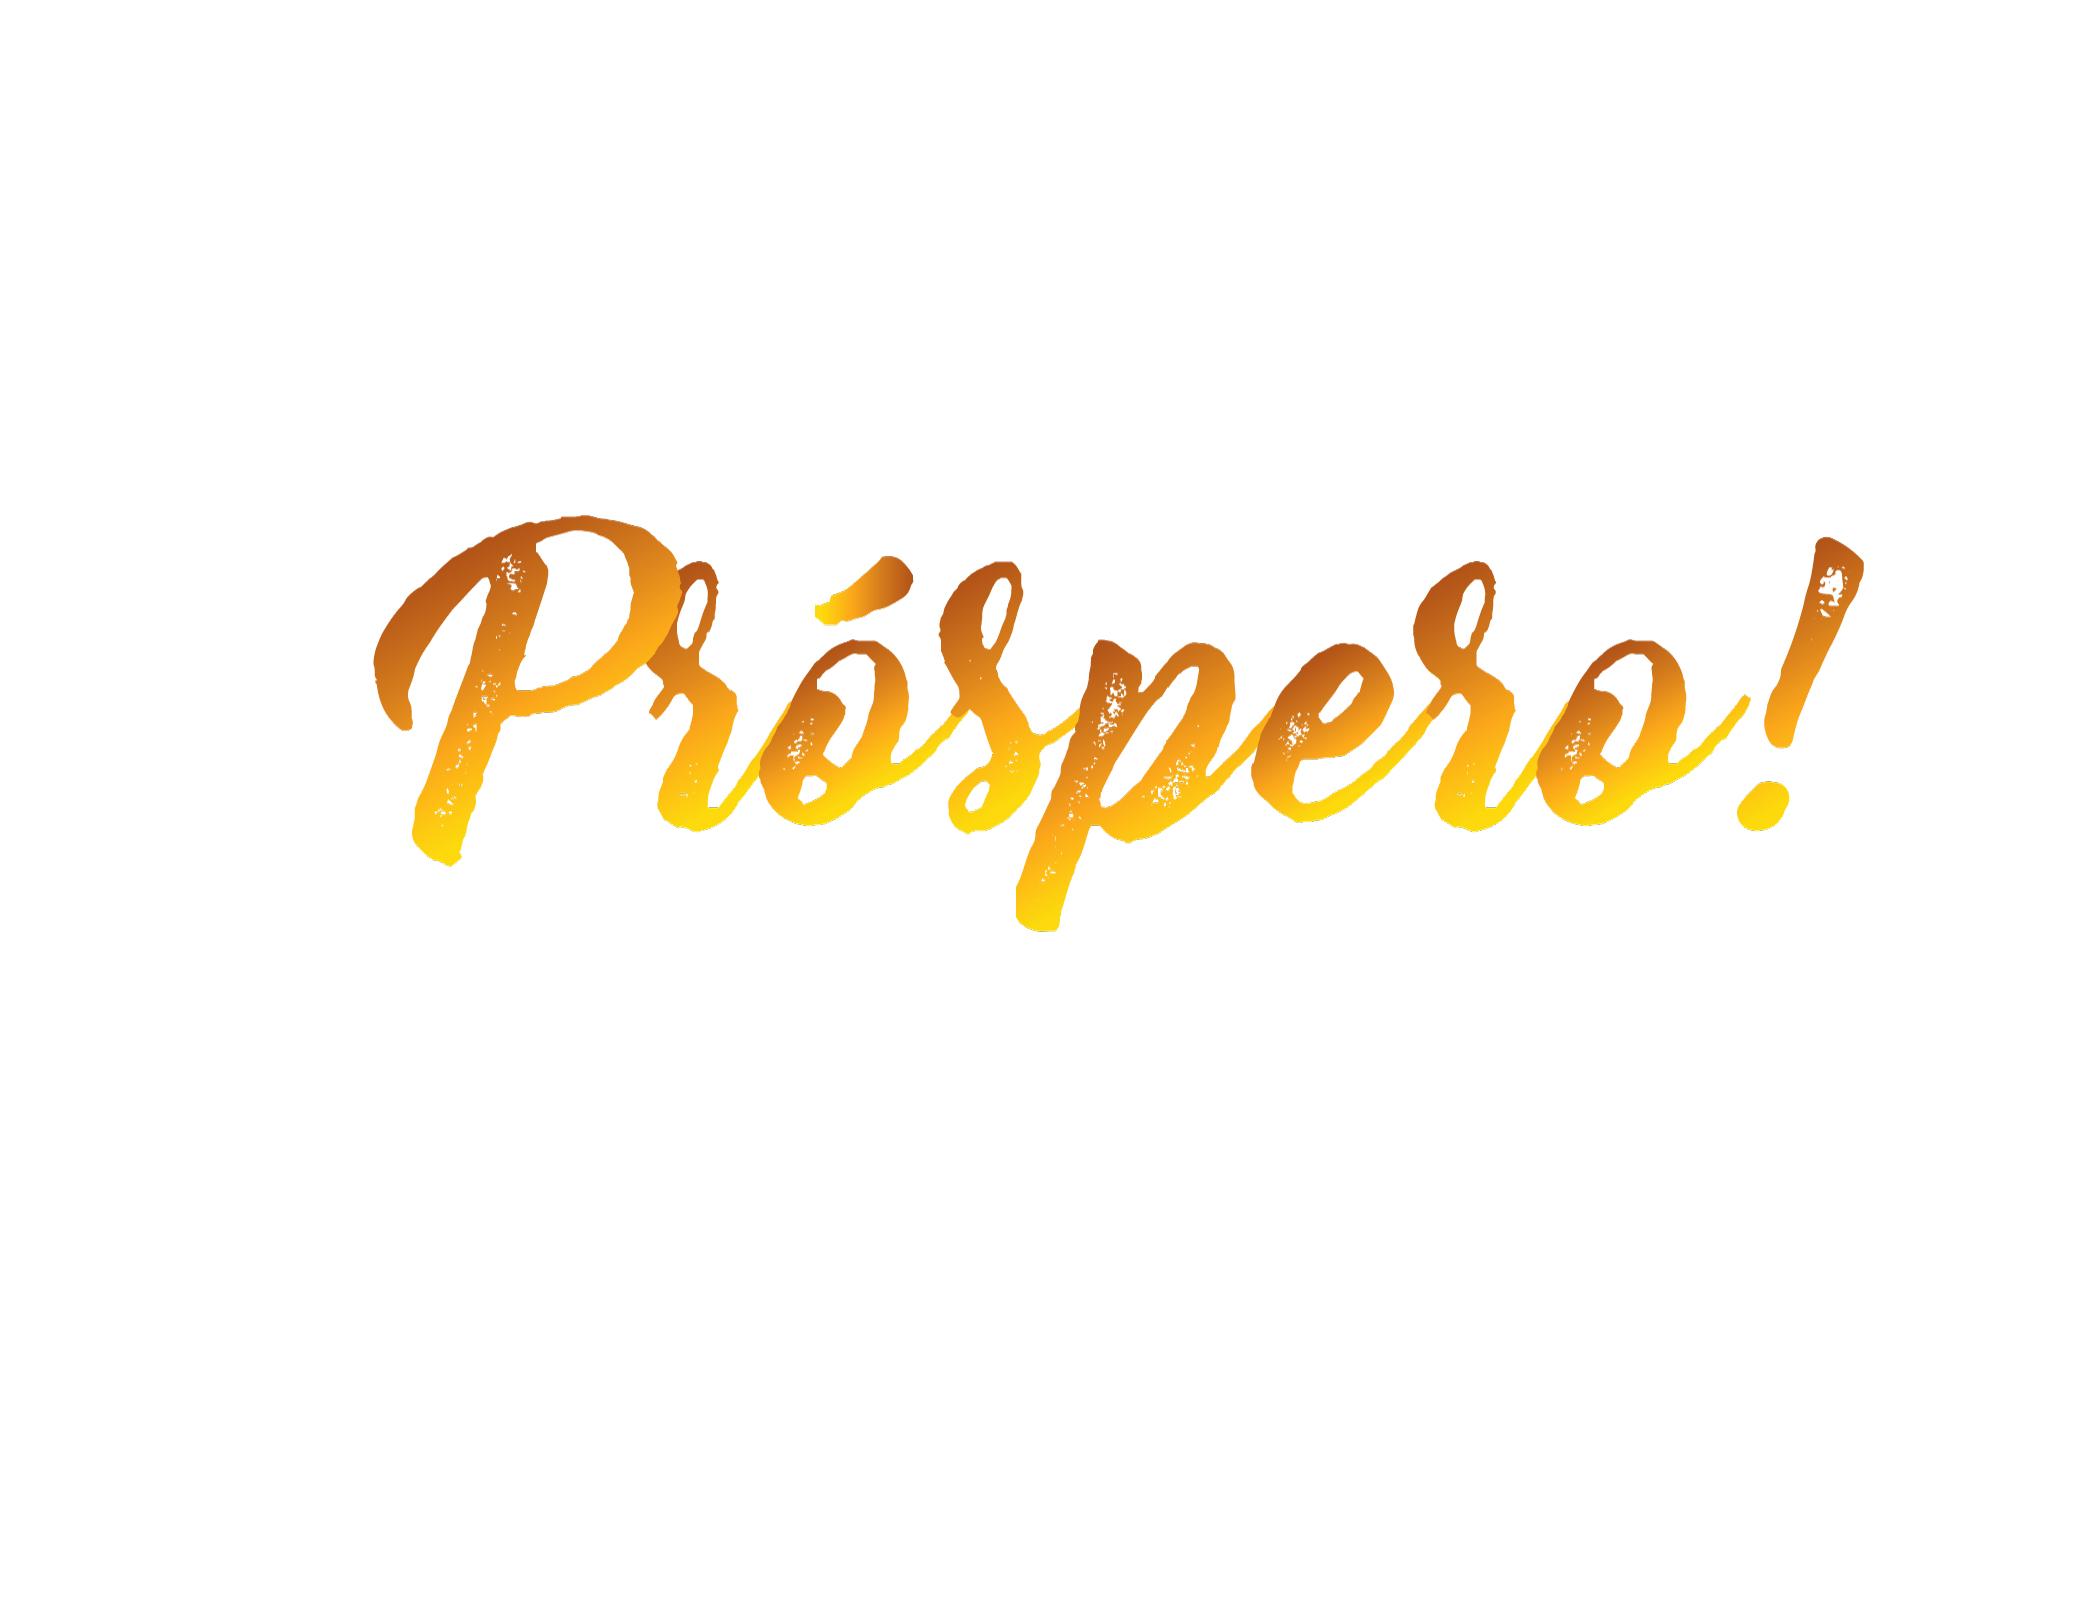 Prospero! Award Logo